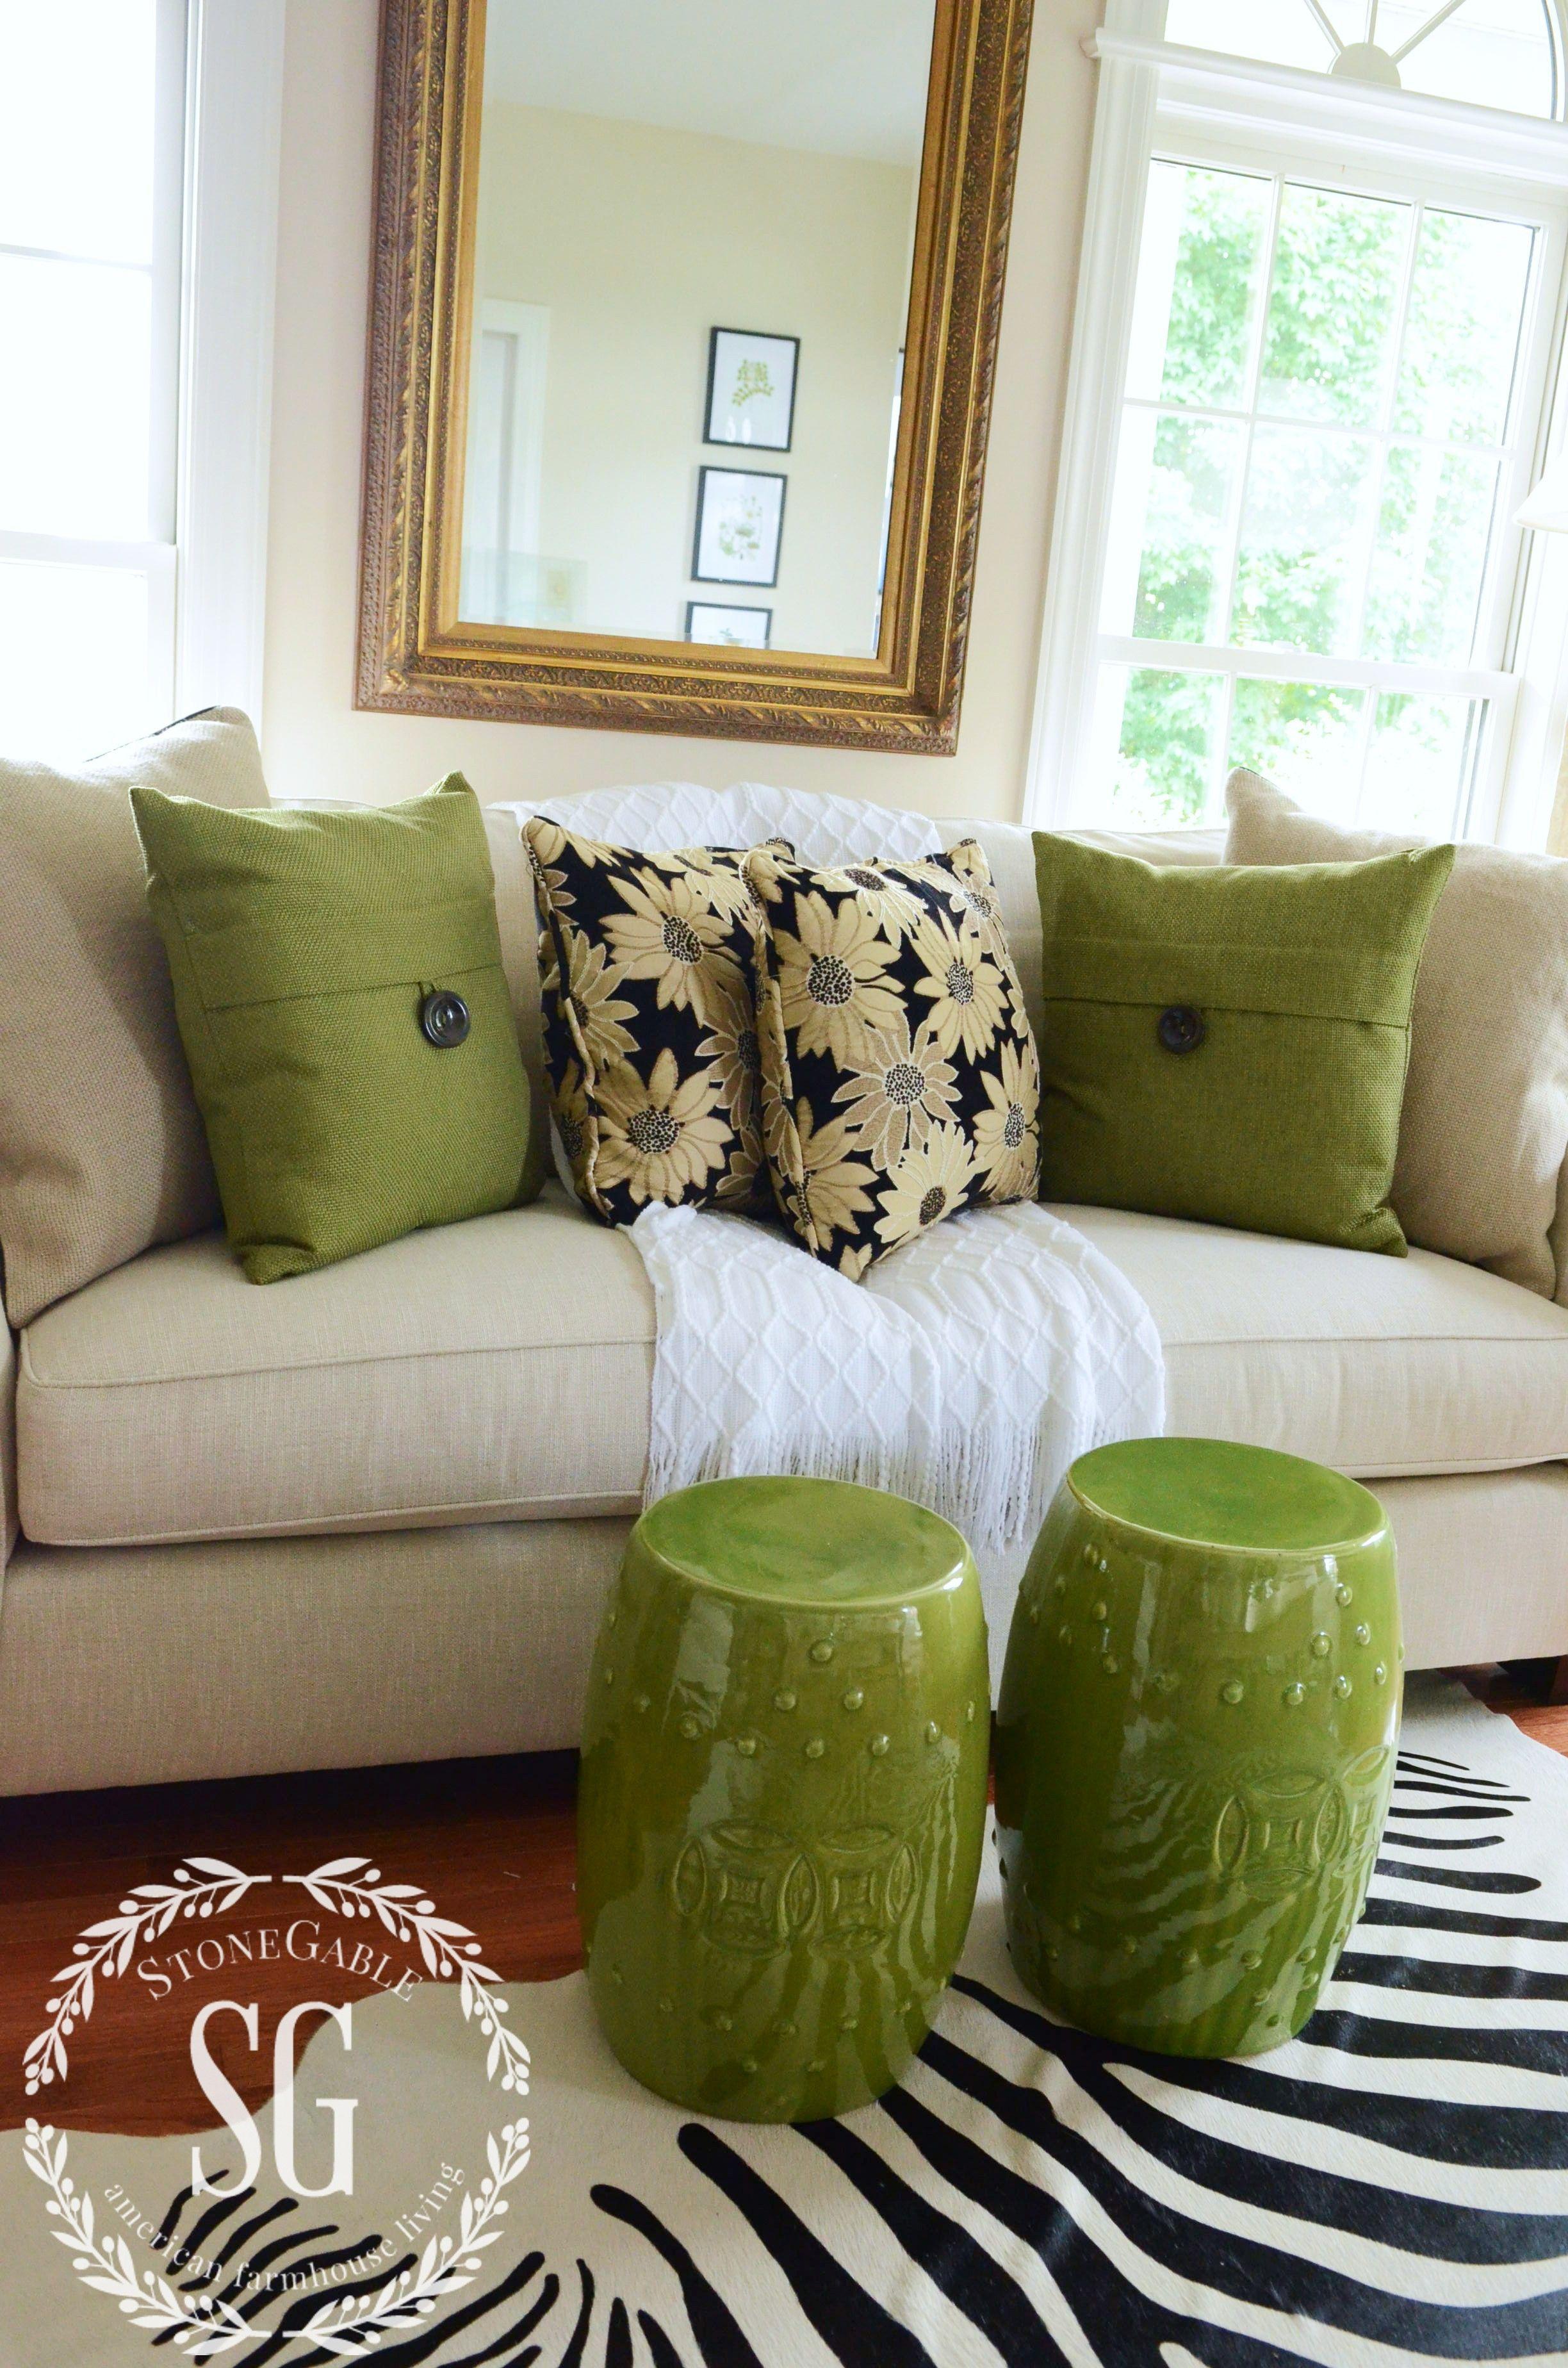 5 No Fail Tips For Arranging Pillows Stonegable Sofa Pillows Arrangement Sofa Styling Living Room Colors